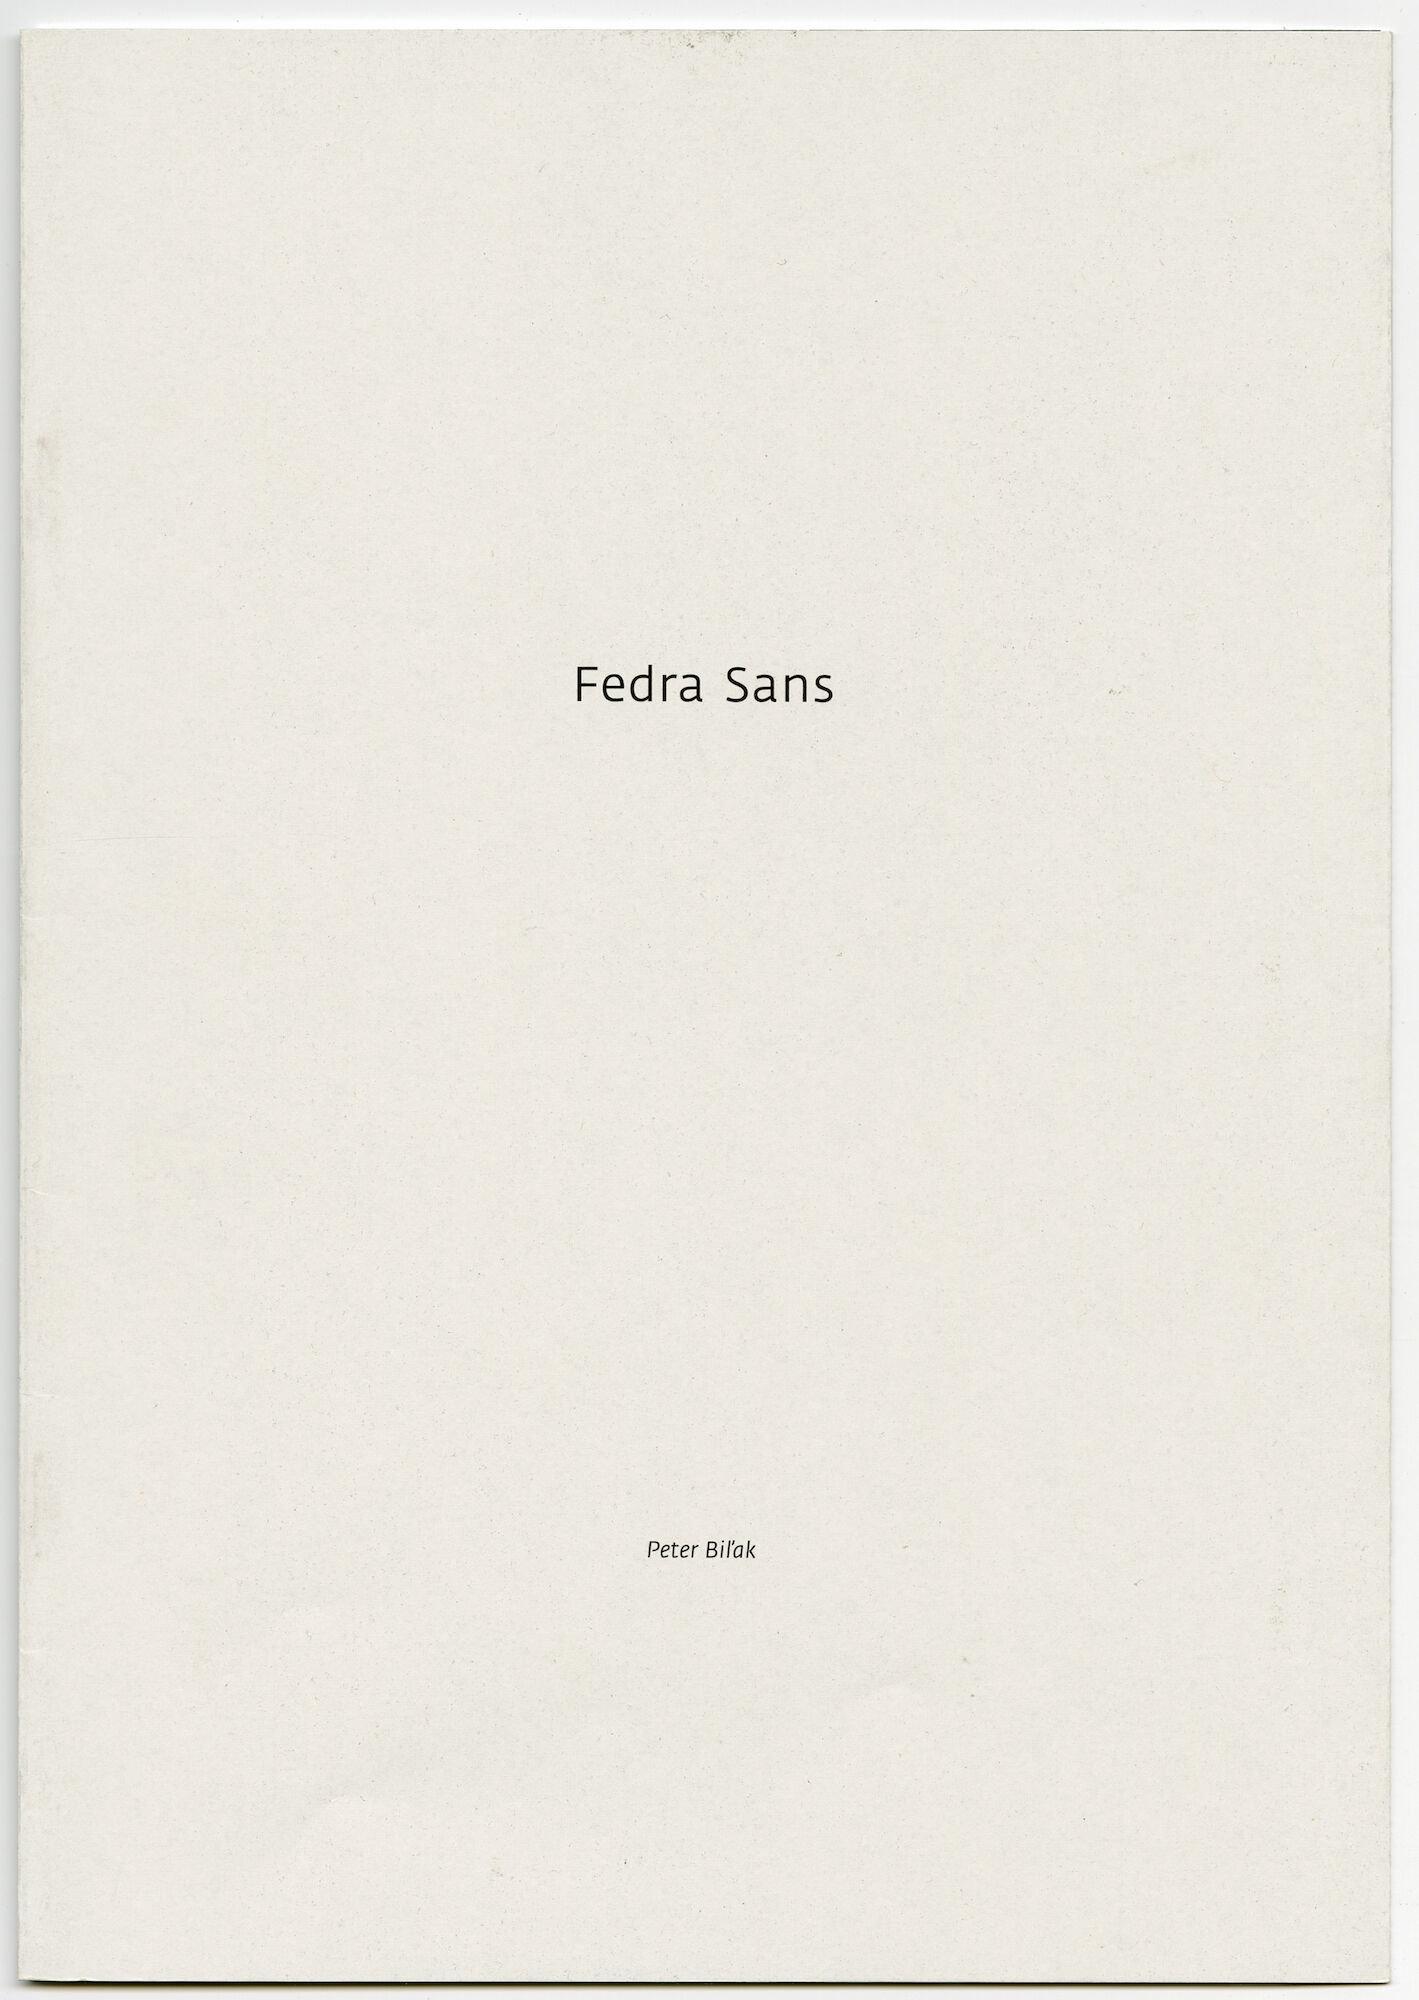 Letterproef met het lettertype Fedra Sans